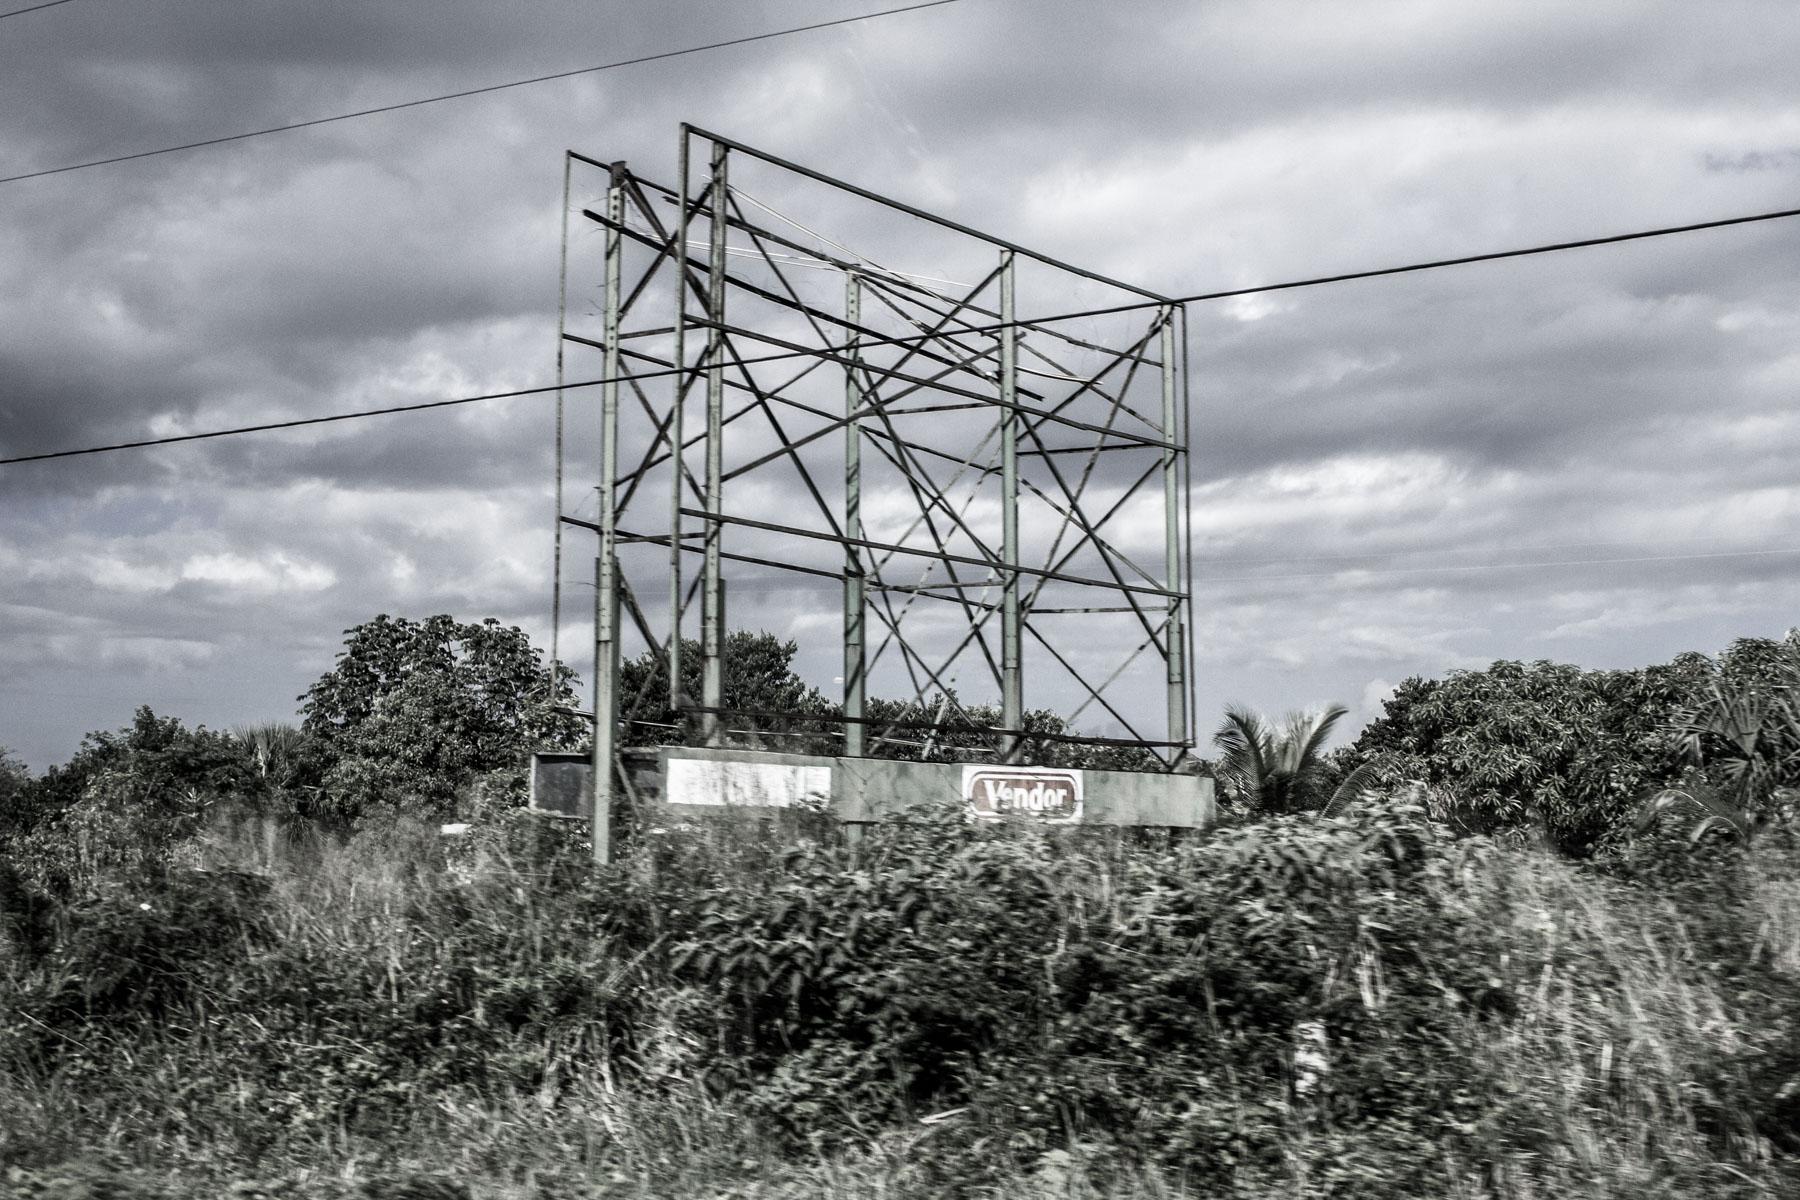 Paisaje Arquetipo - fotografo artista colombiano-2473.jpg